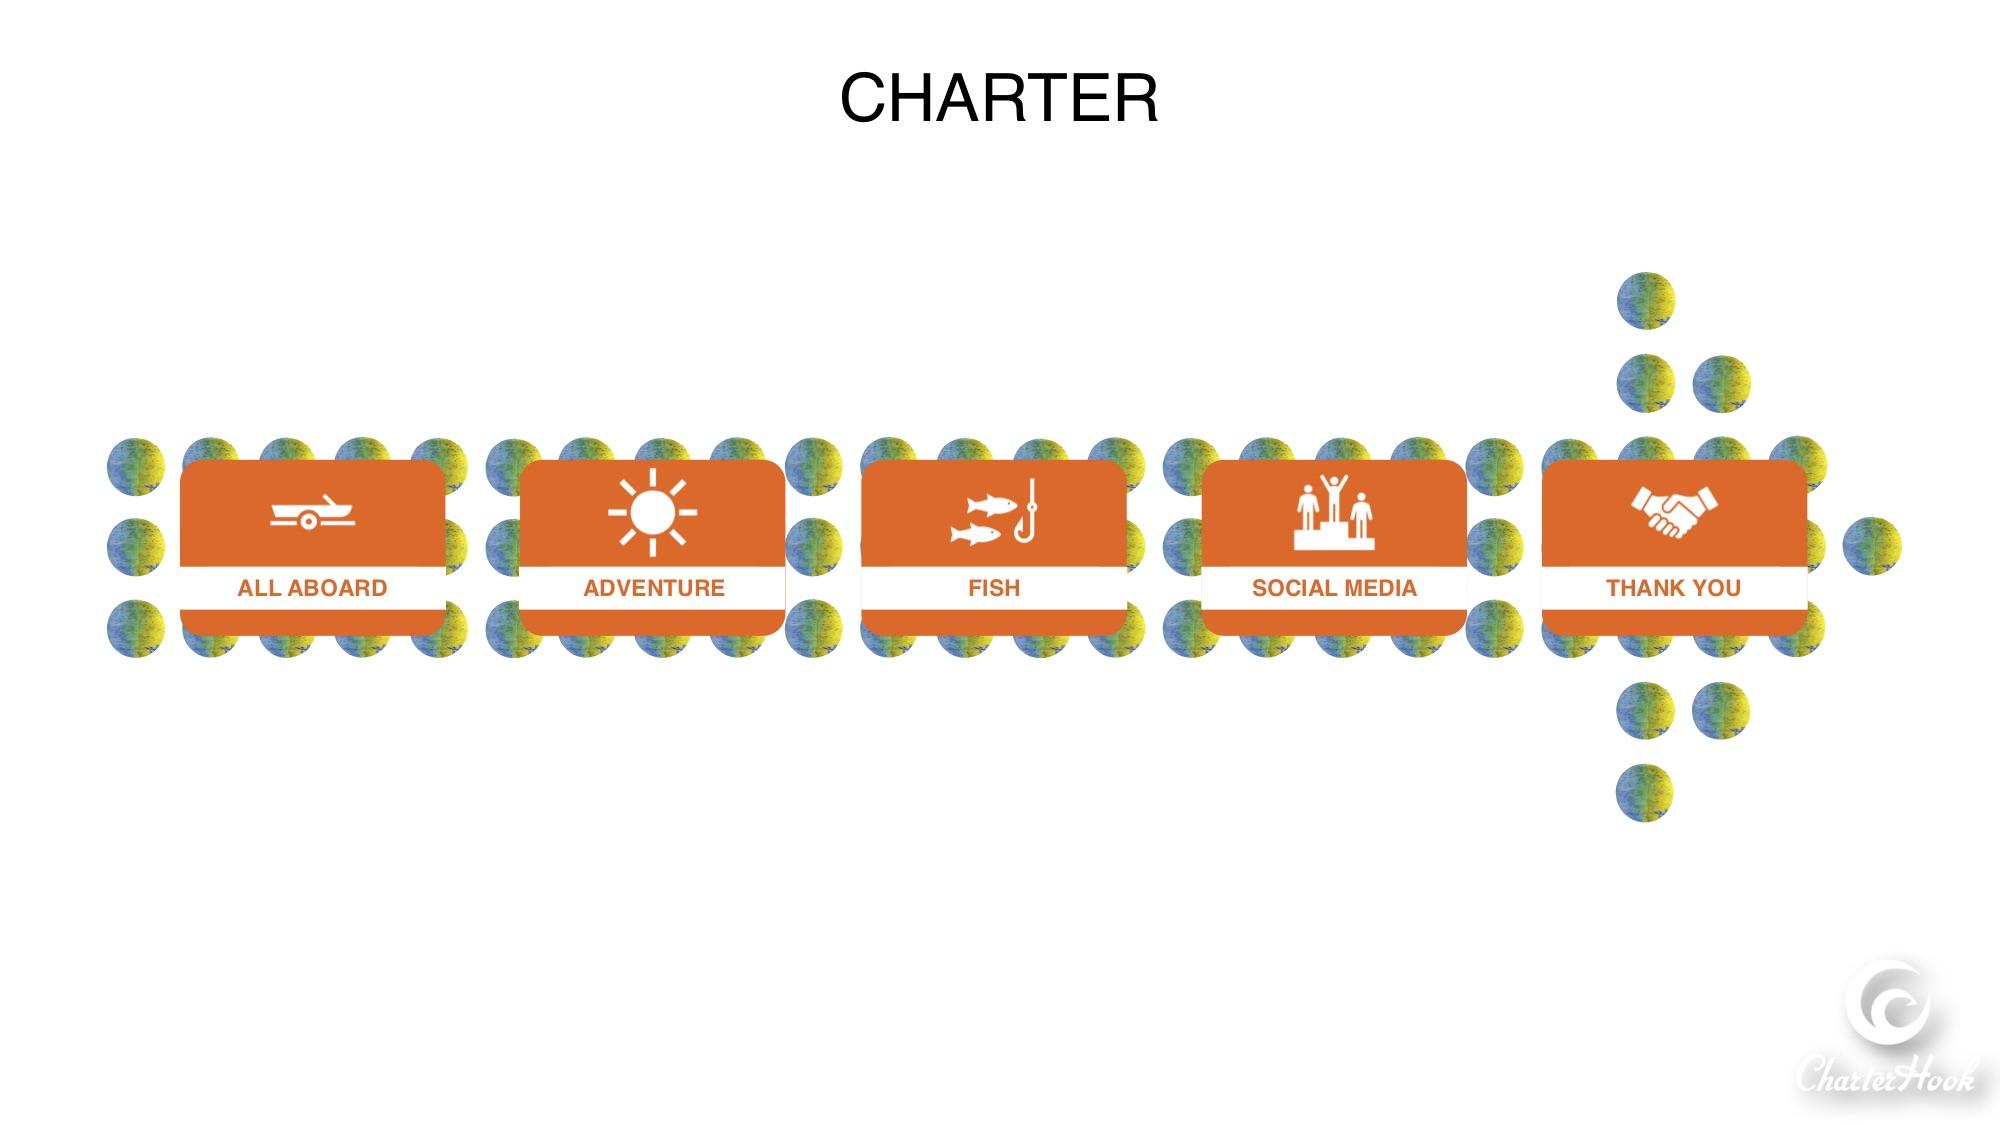 Charterhook_Demo Day Pitch Deck_08162018_6.jpg